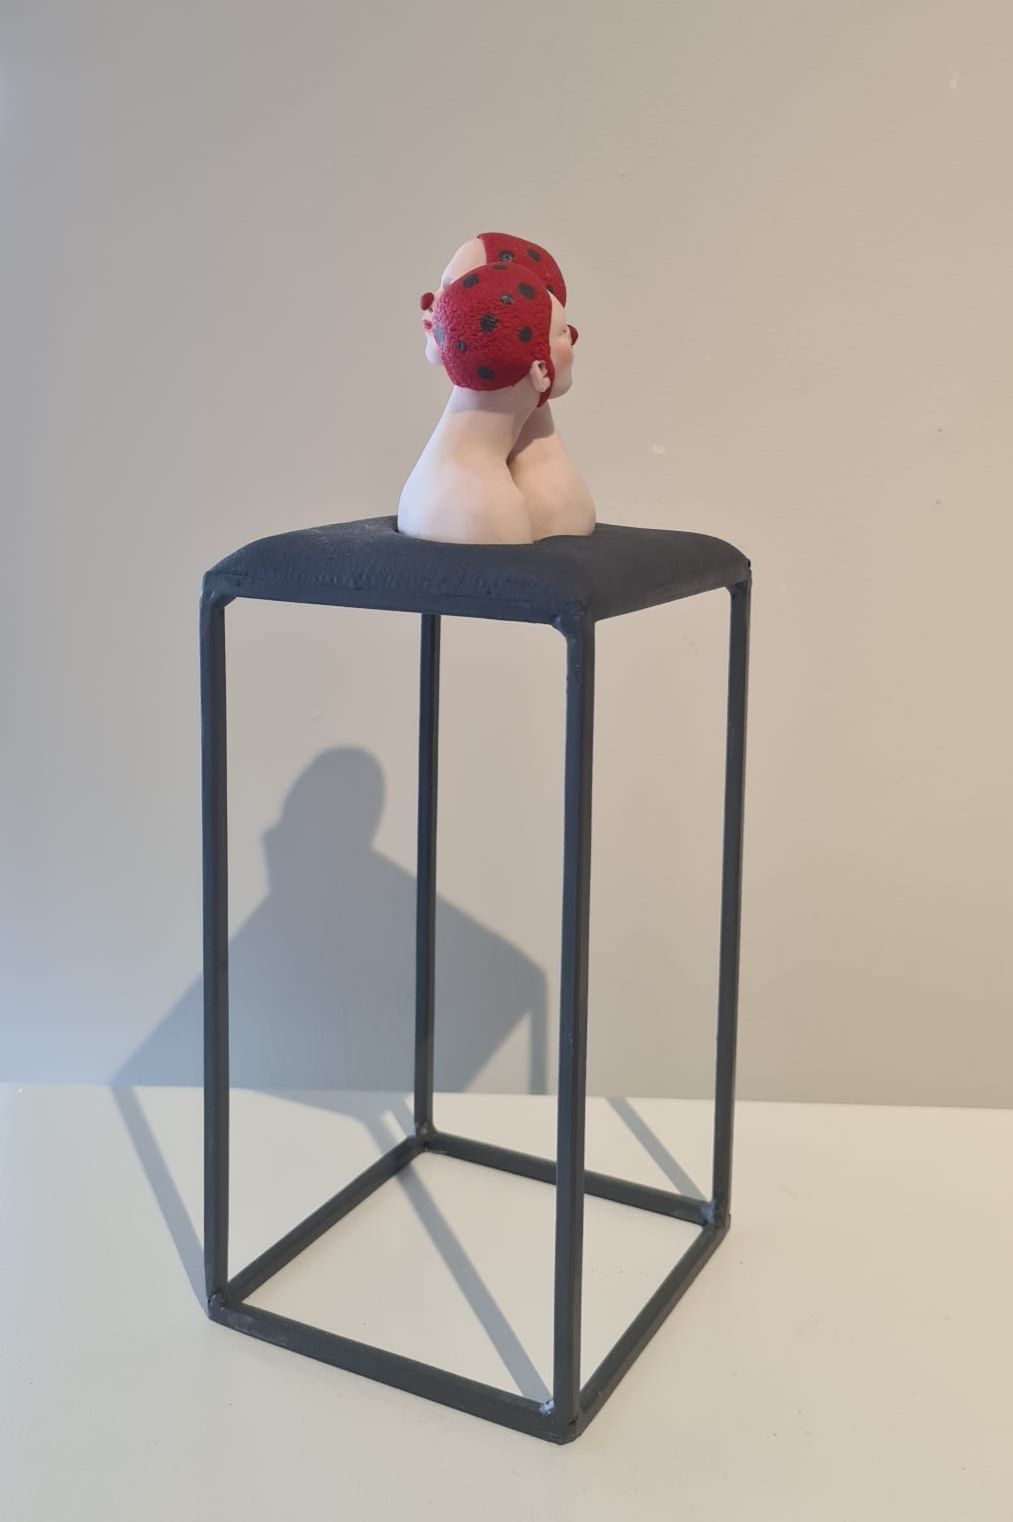 Kunst: Samen één van kunstenaar Saskia Hoeboer